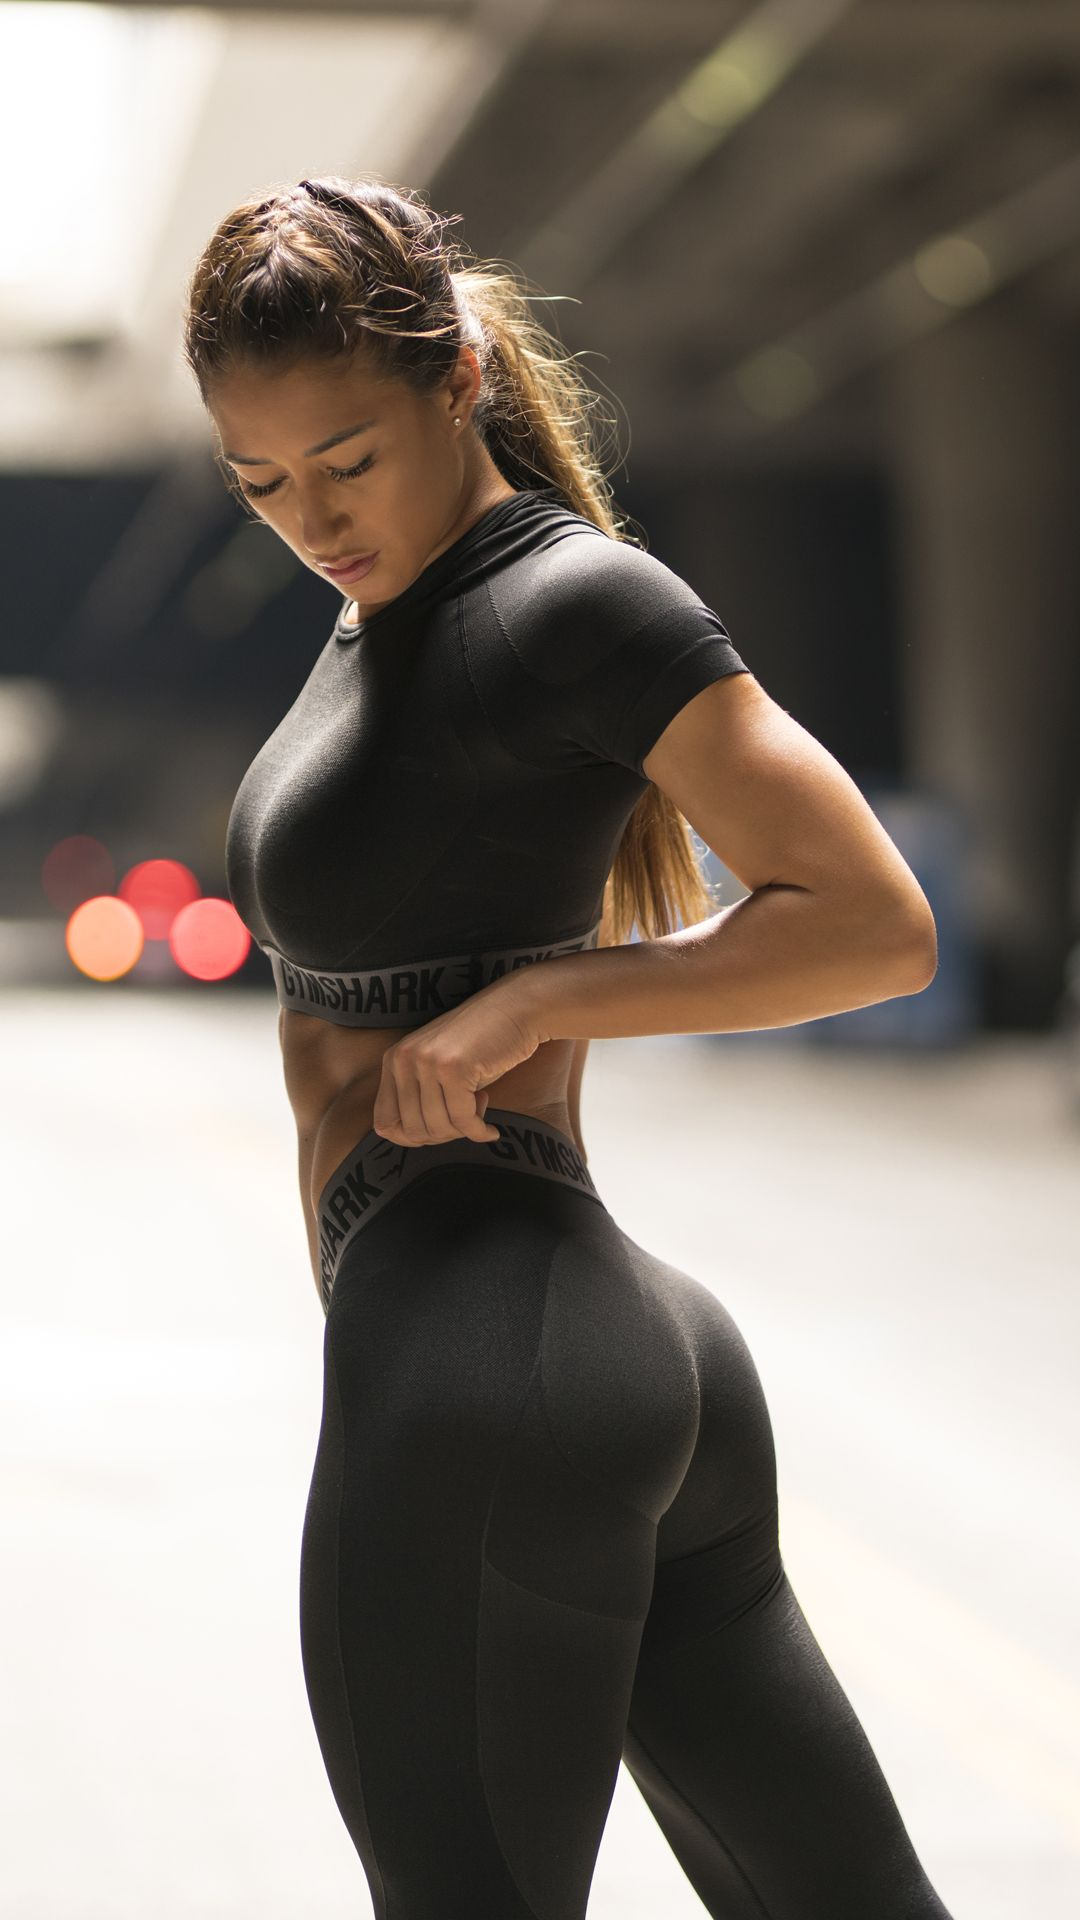 gymshark flex crop top - black marl/charcoal | flex leggings, black